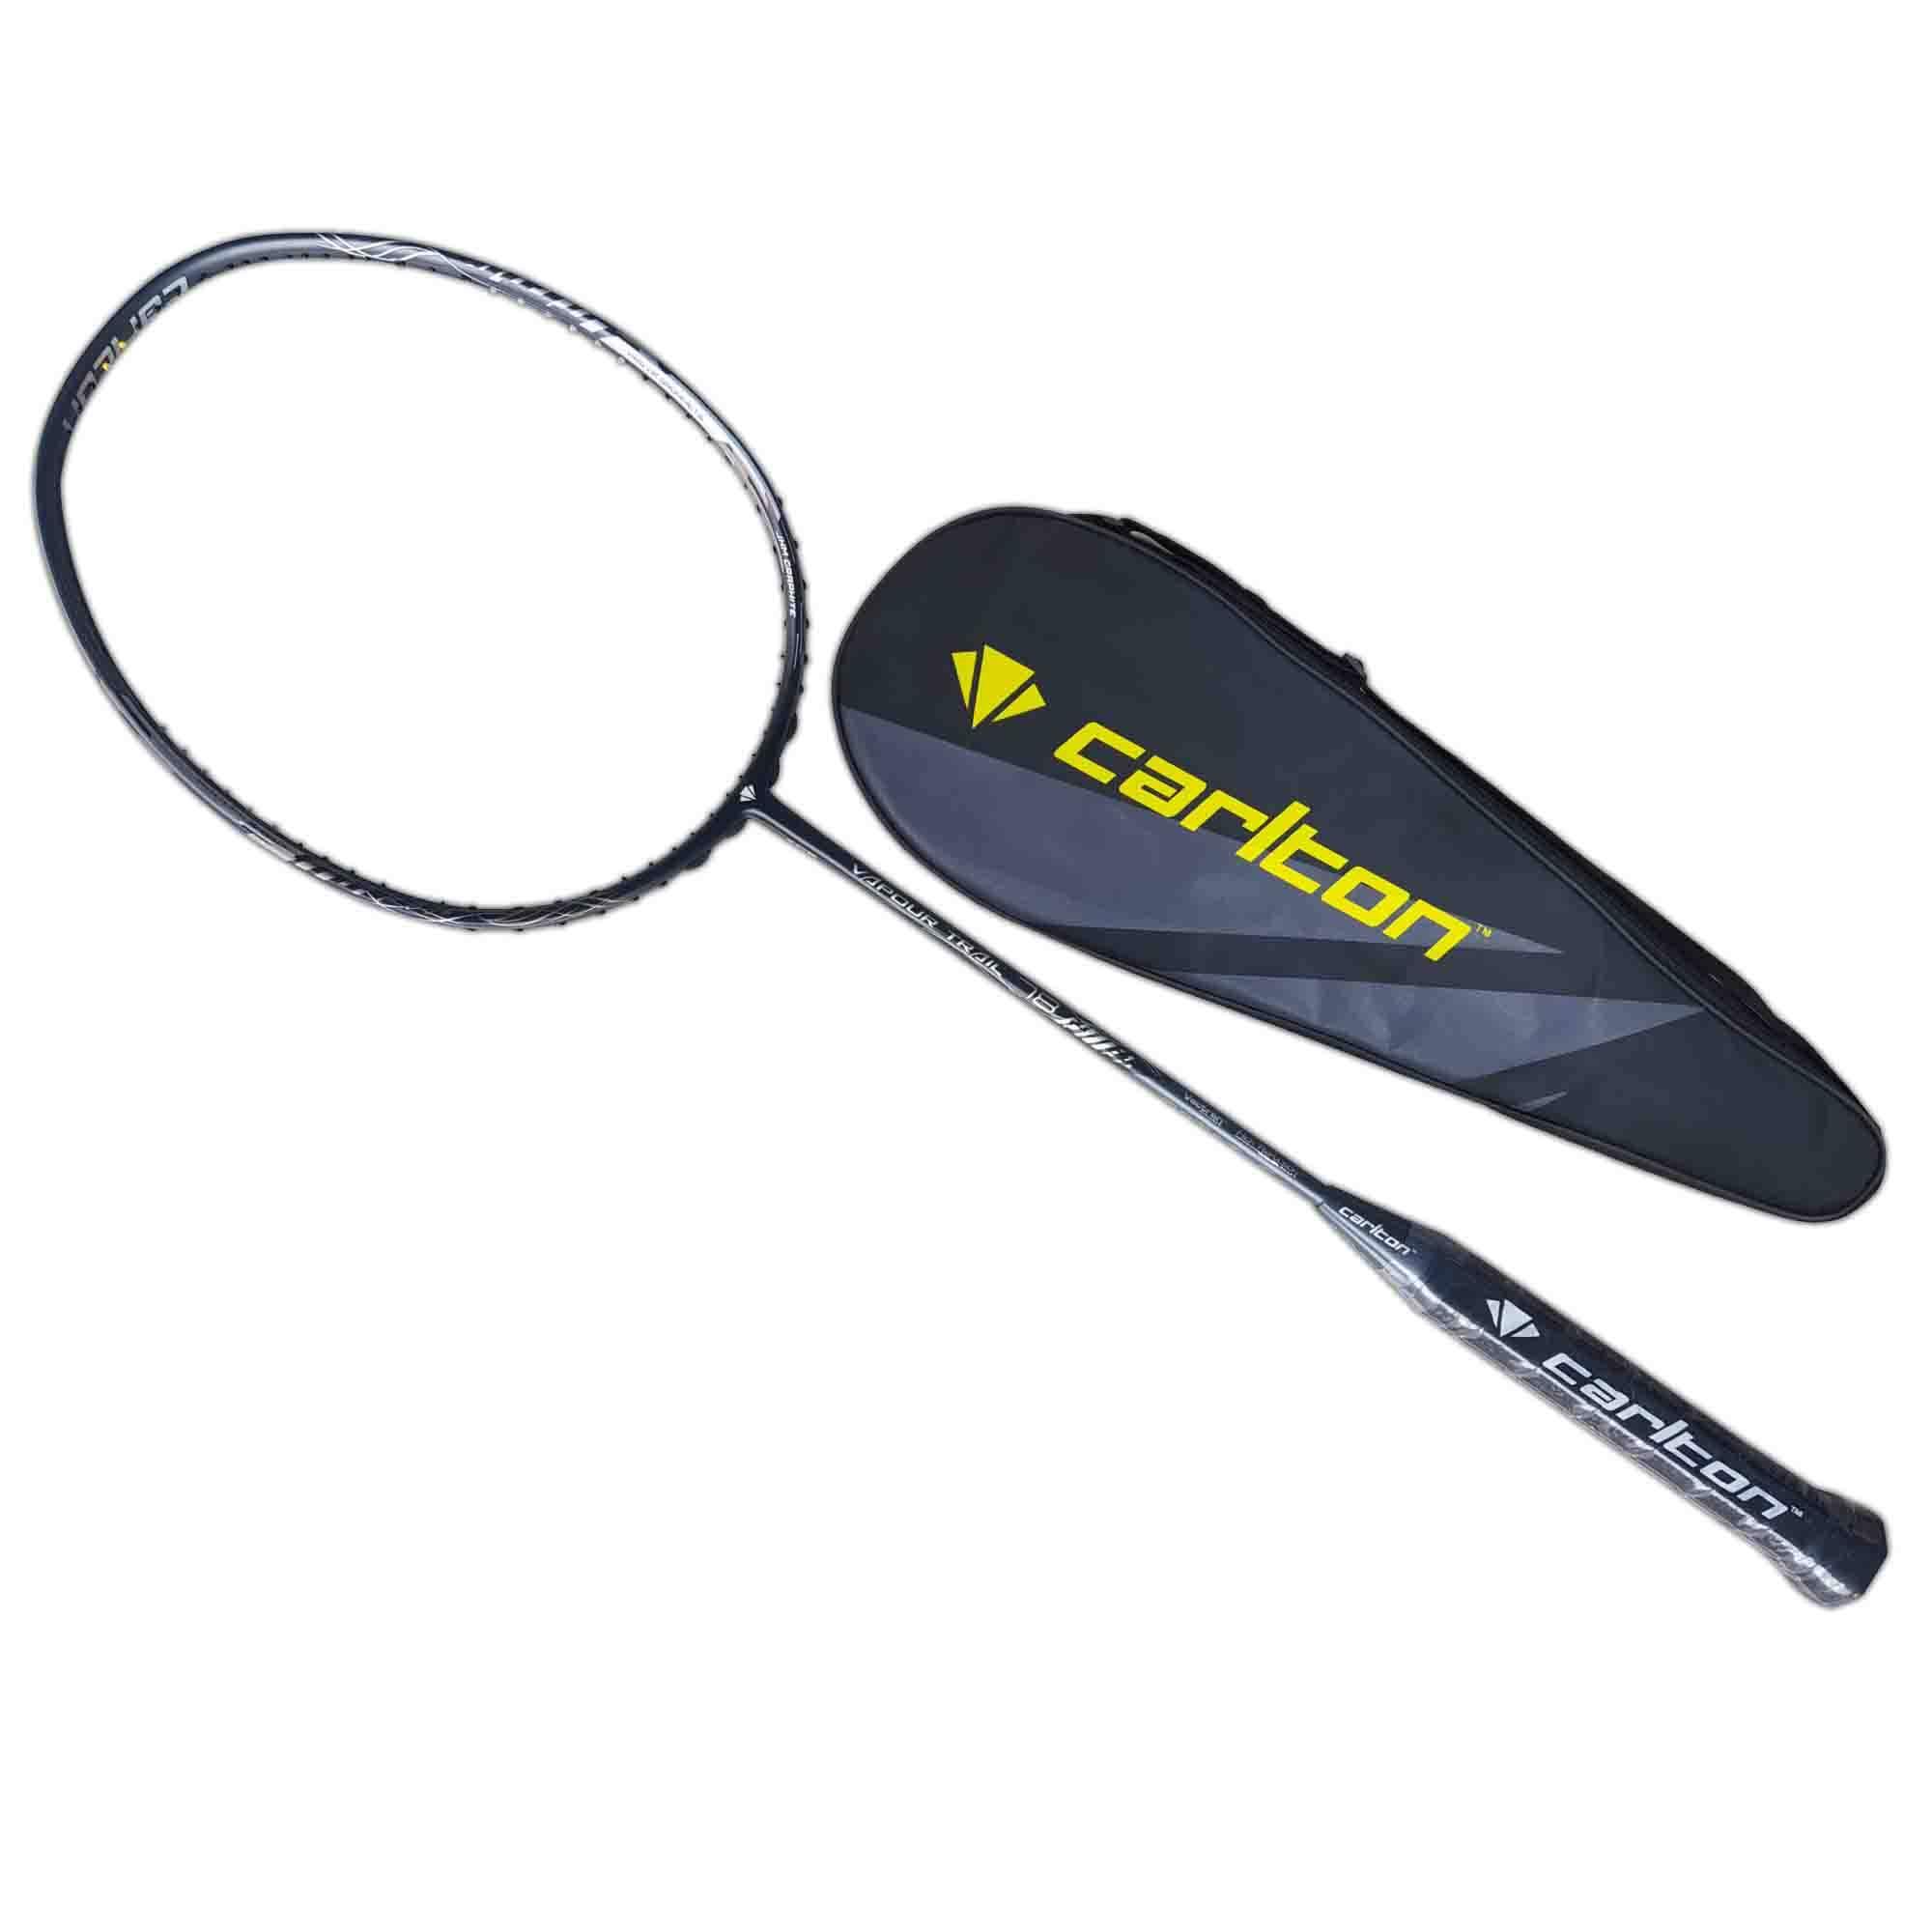 Carlton Badminton Racket Vapour Trail 78 5U